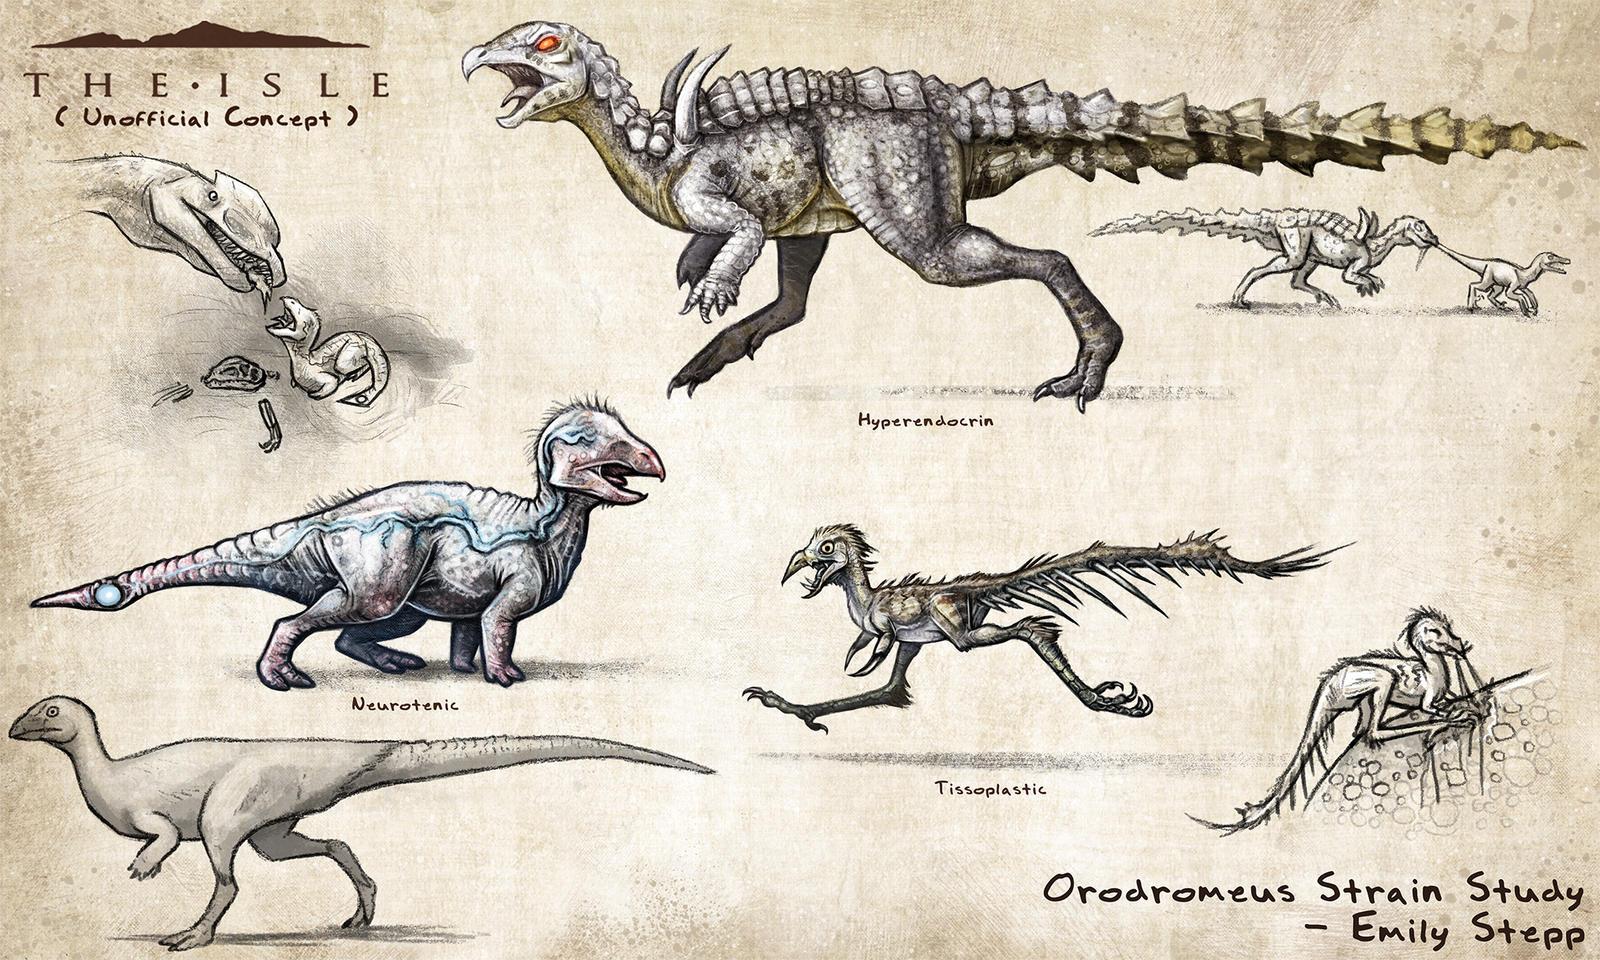 The Isle Fan Concept - Orodromeus Strains by EmilyStepp